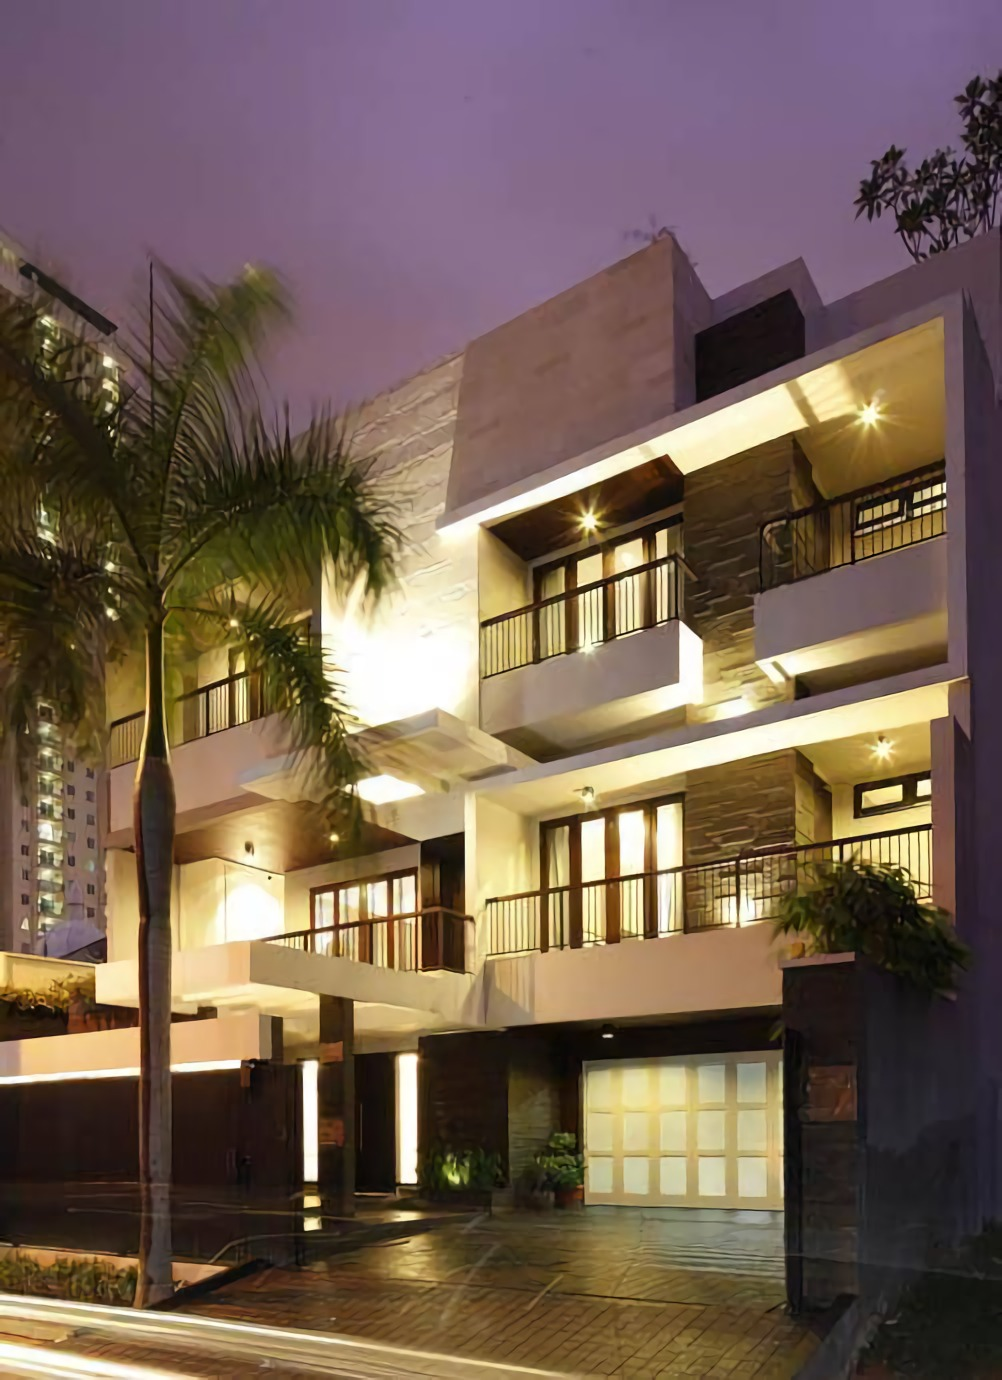 The Line House at Kelapa Gading di Jakarta karya Julio Julianto tahun 2008 (Sumber: arsitag.com)